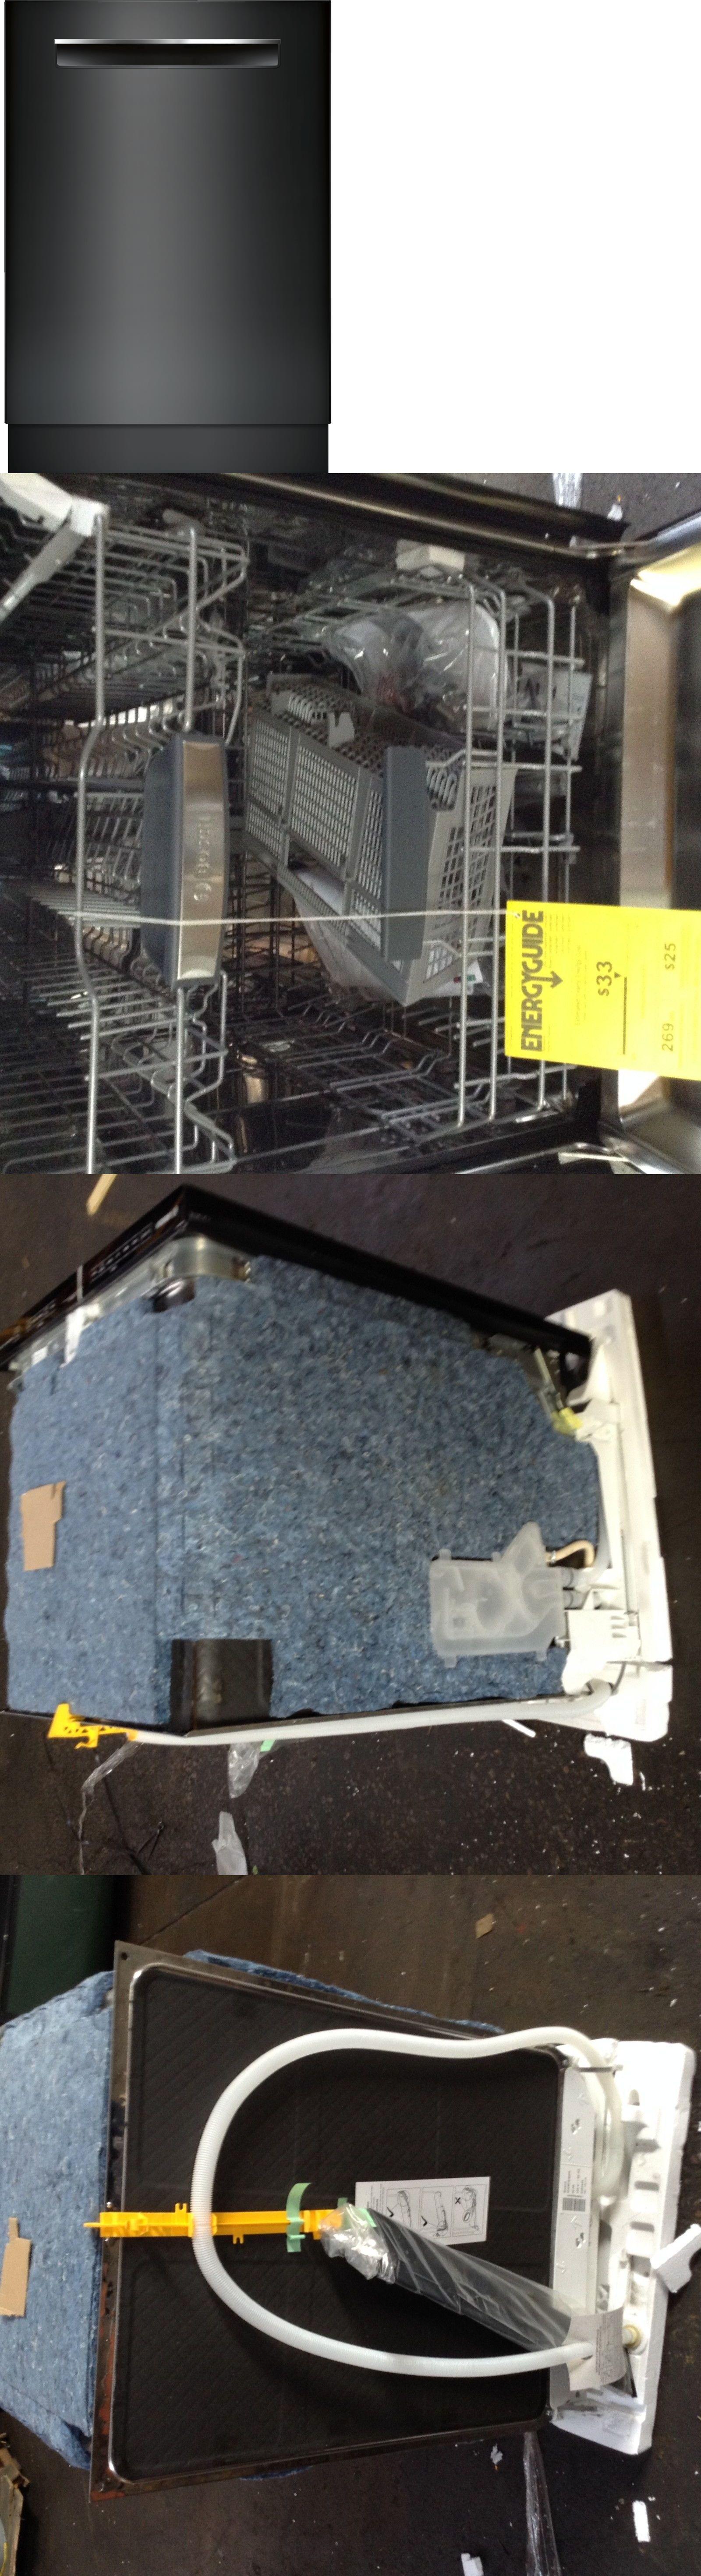 Bosch Shpm 78w56n 800 Series 24 Dishwasher Stainless Steel Tall Tub Black Black Dishwasher Bosch Tub